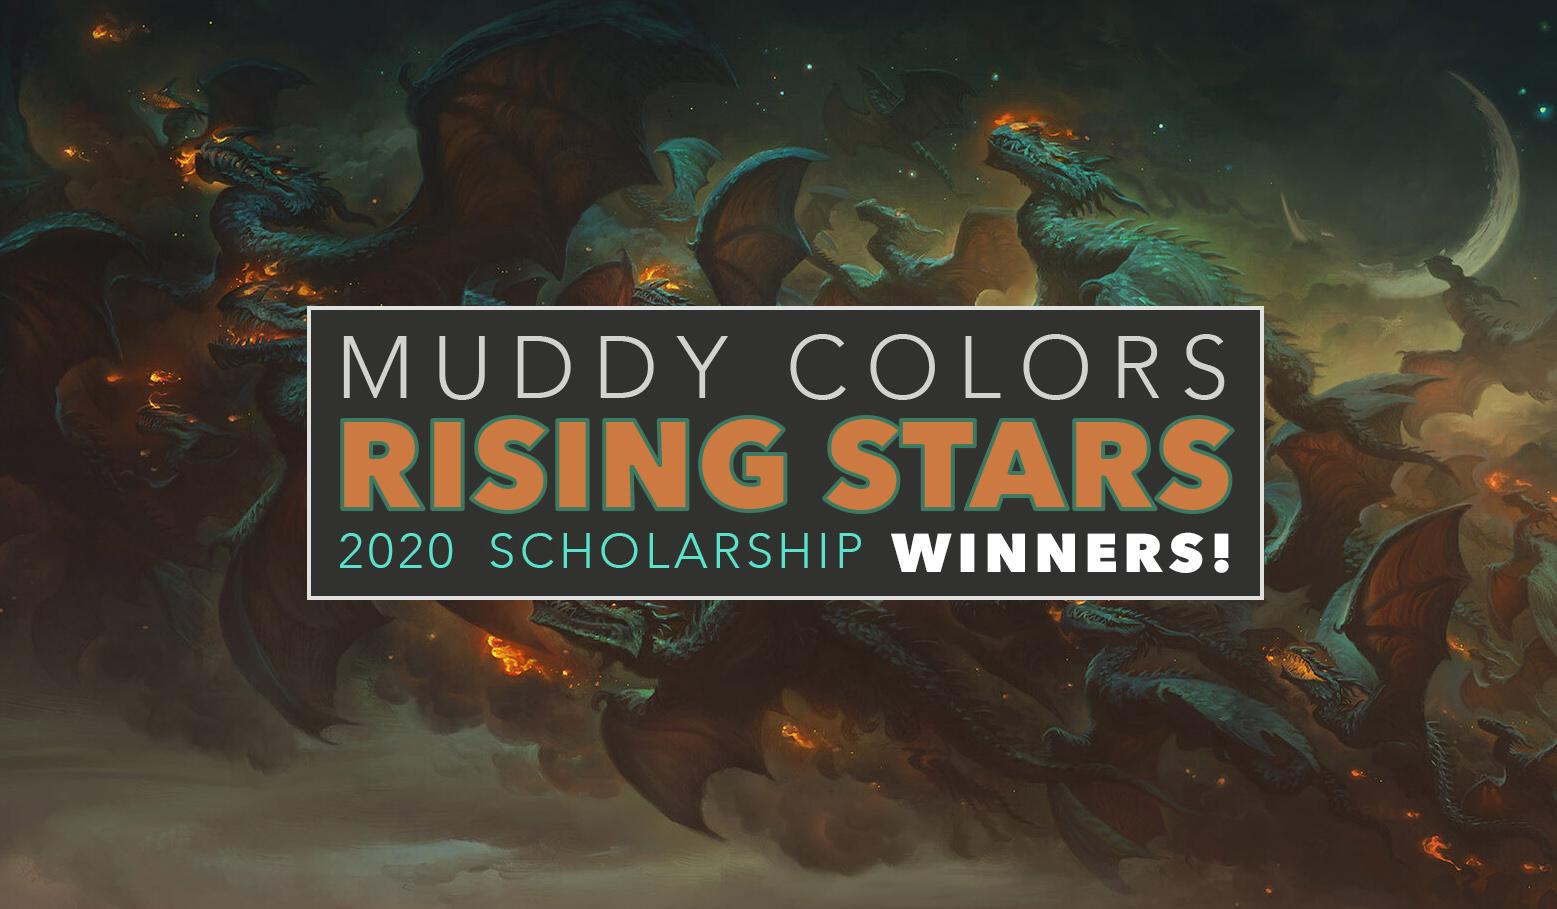 2020 Rising Star Winners!